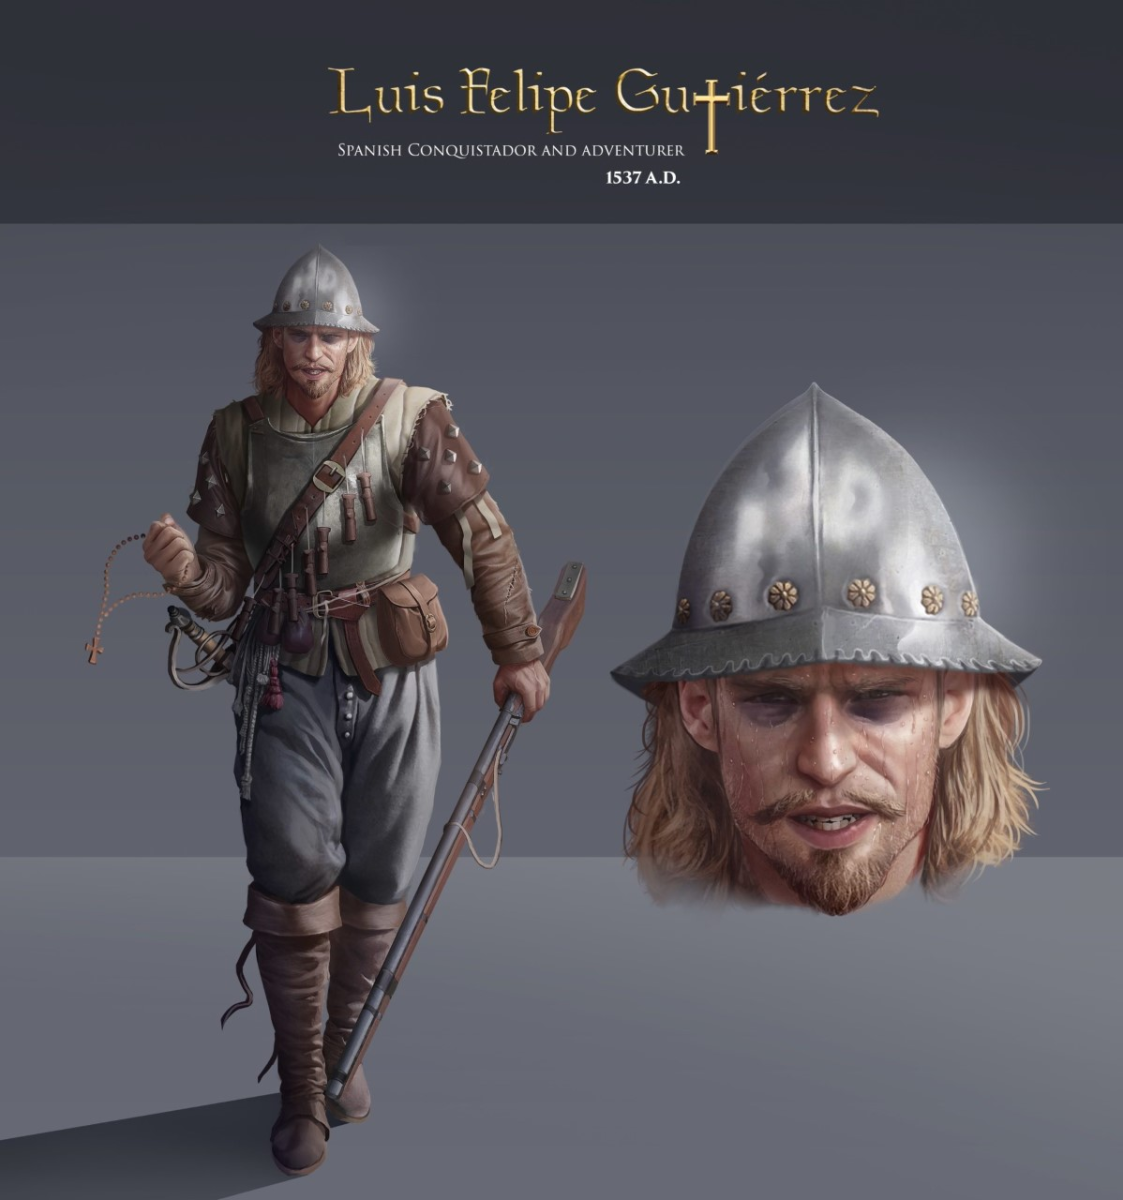 Luis Felipe Gutierrez: Doomed Conquistador, Peru, 1537 (illustrated)